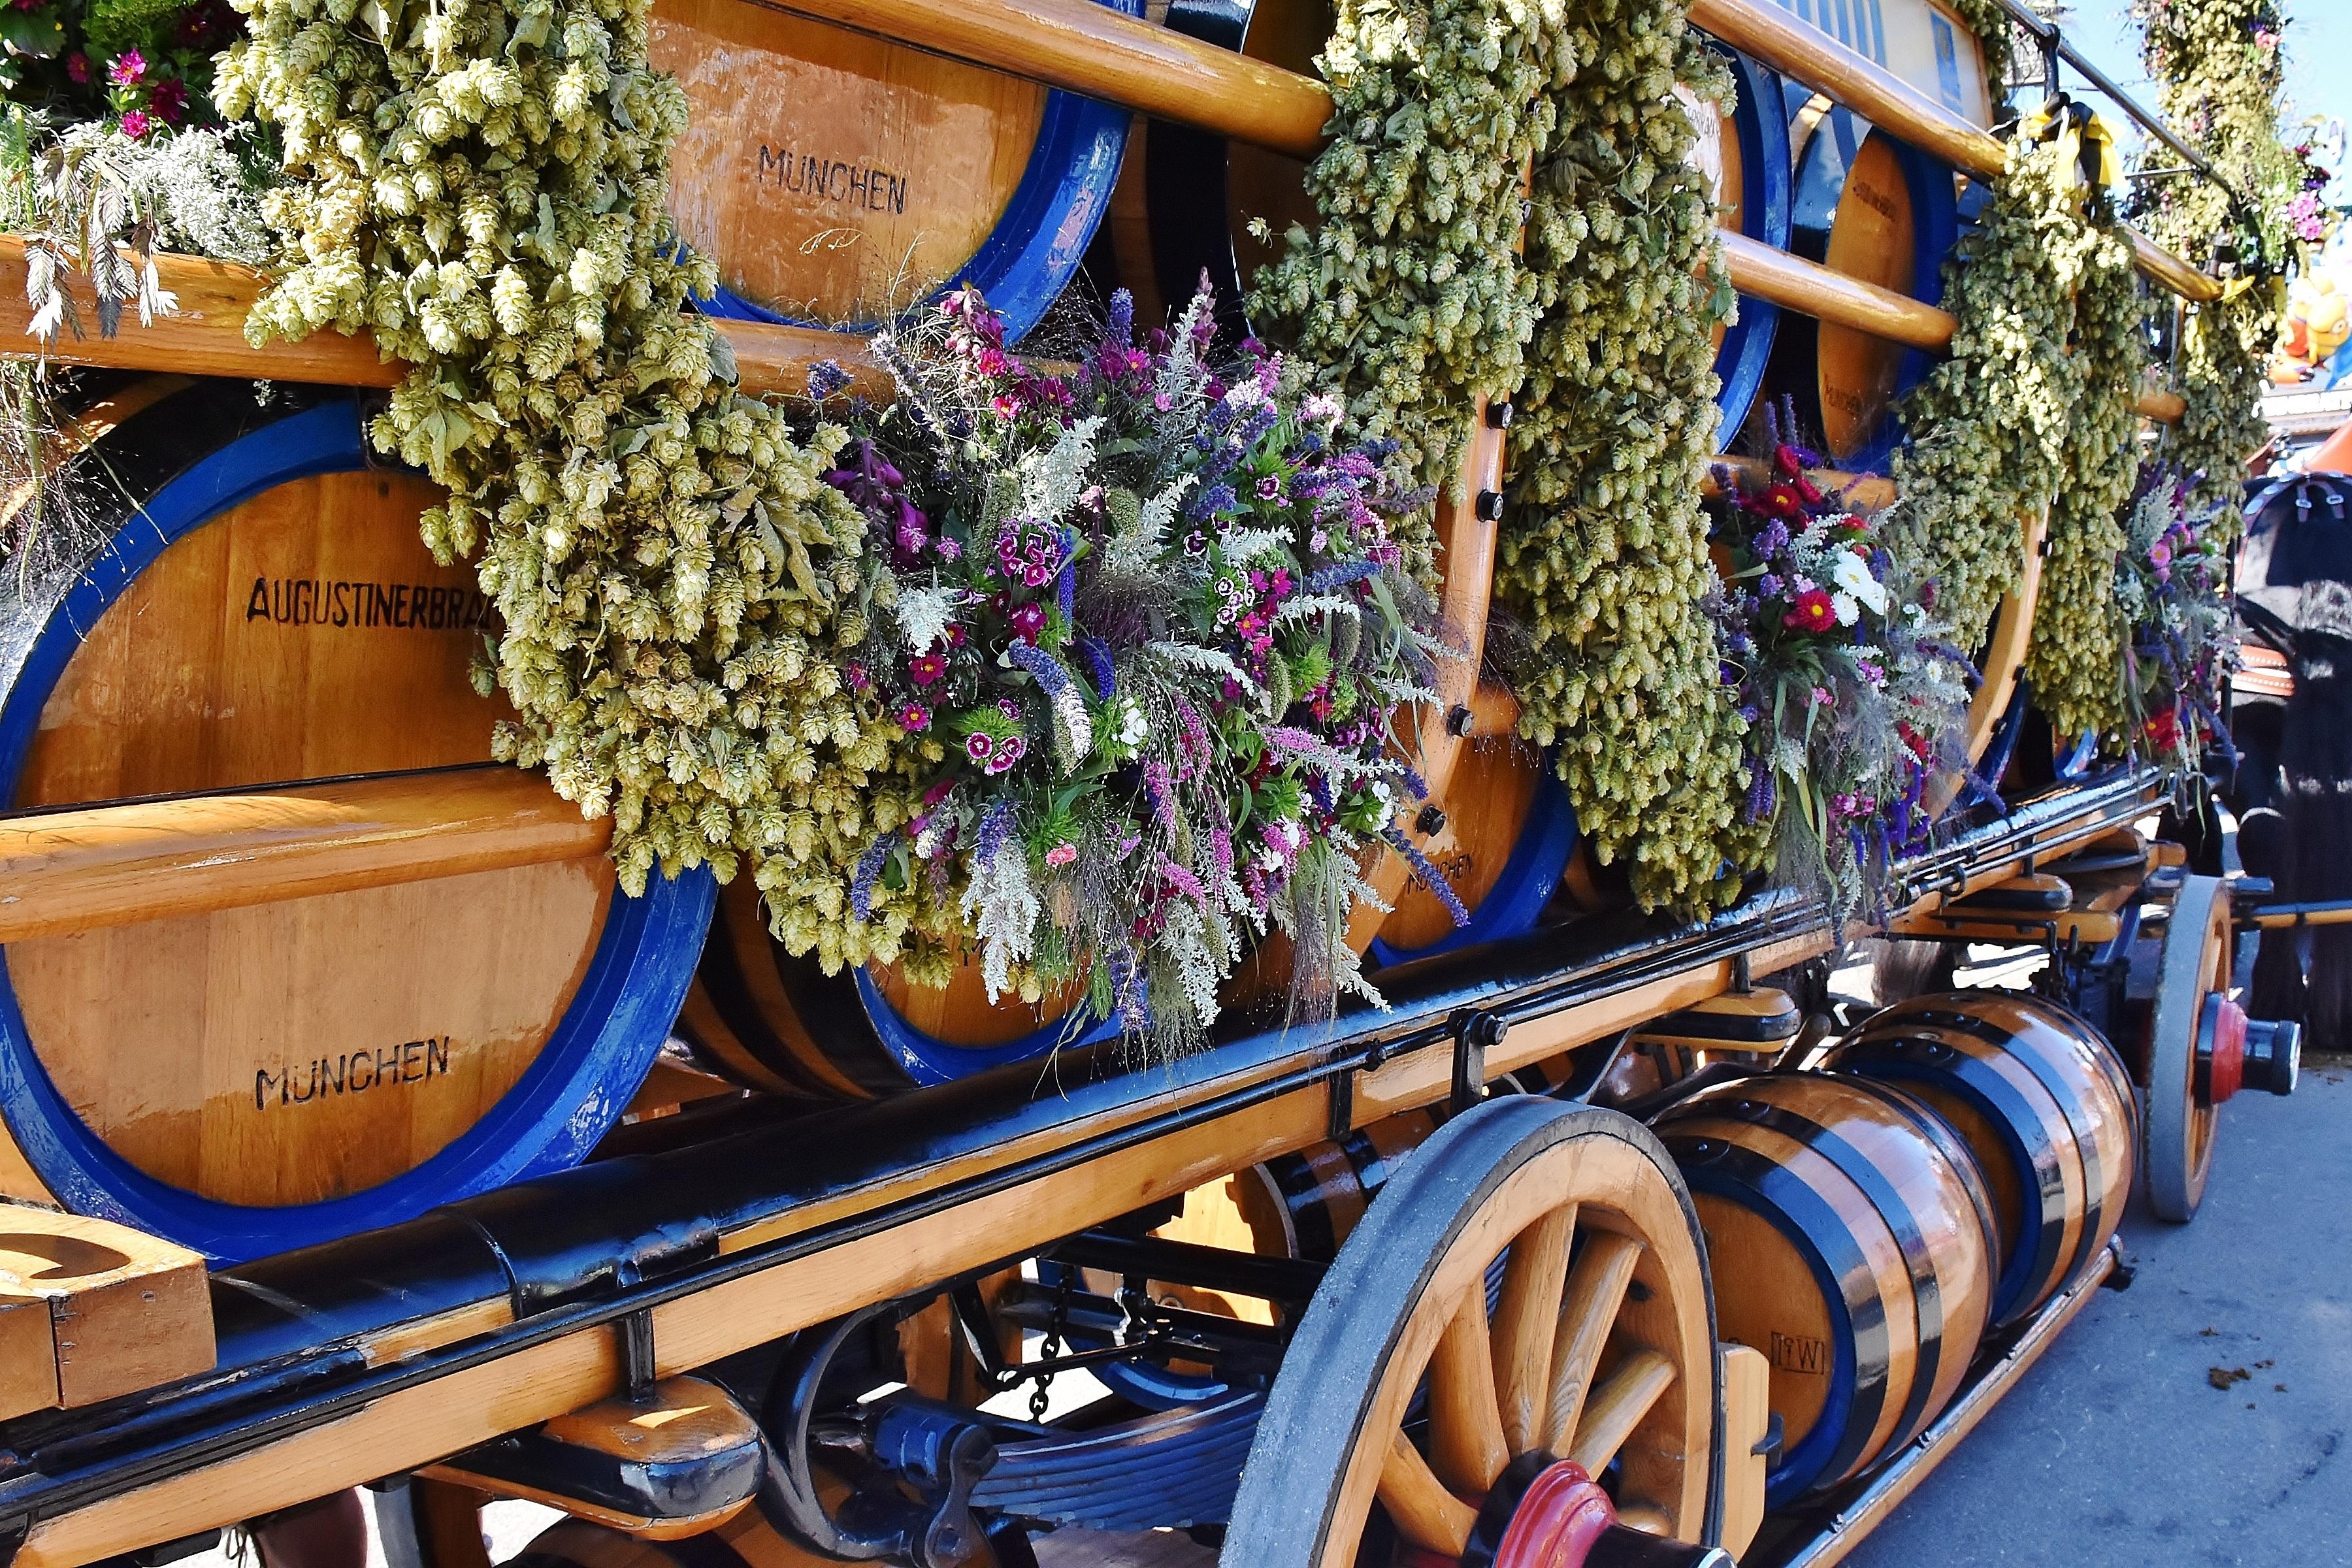 Oktoberfest beer dray wagon